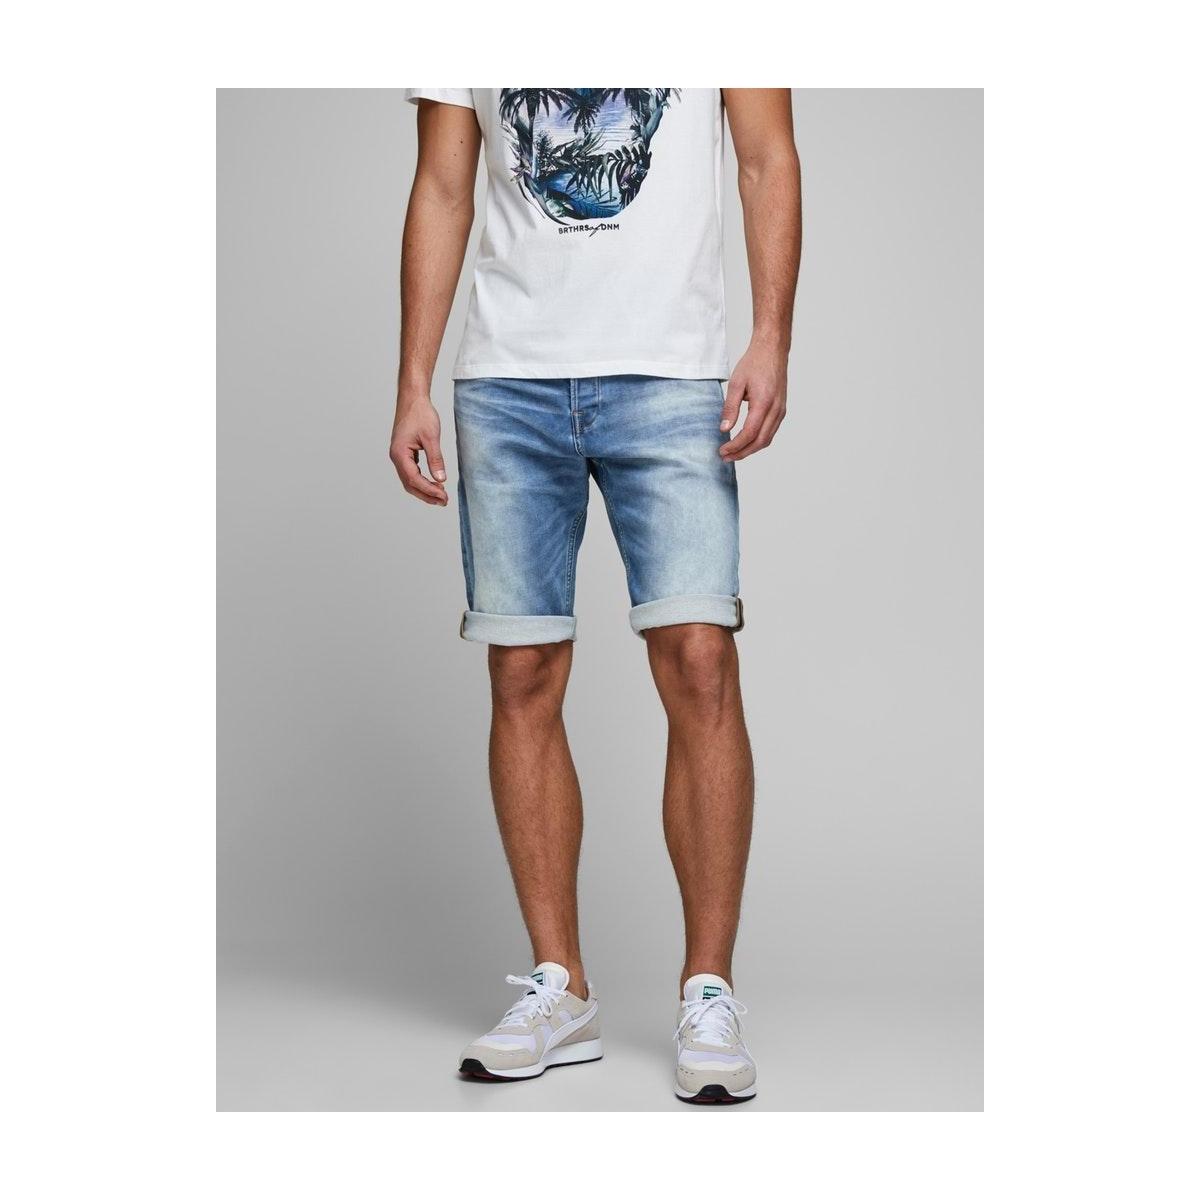 jjirex jjlong shorts ge 022 i.k 12166430 jack & jones korte broek blue denim